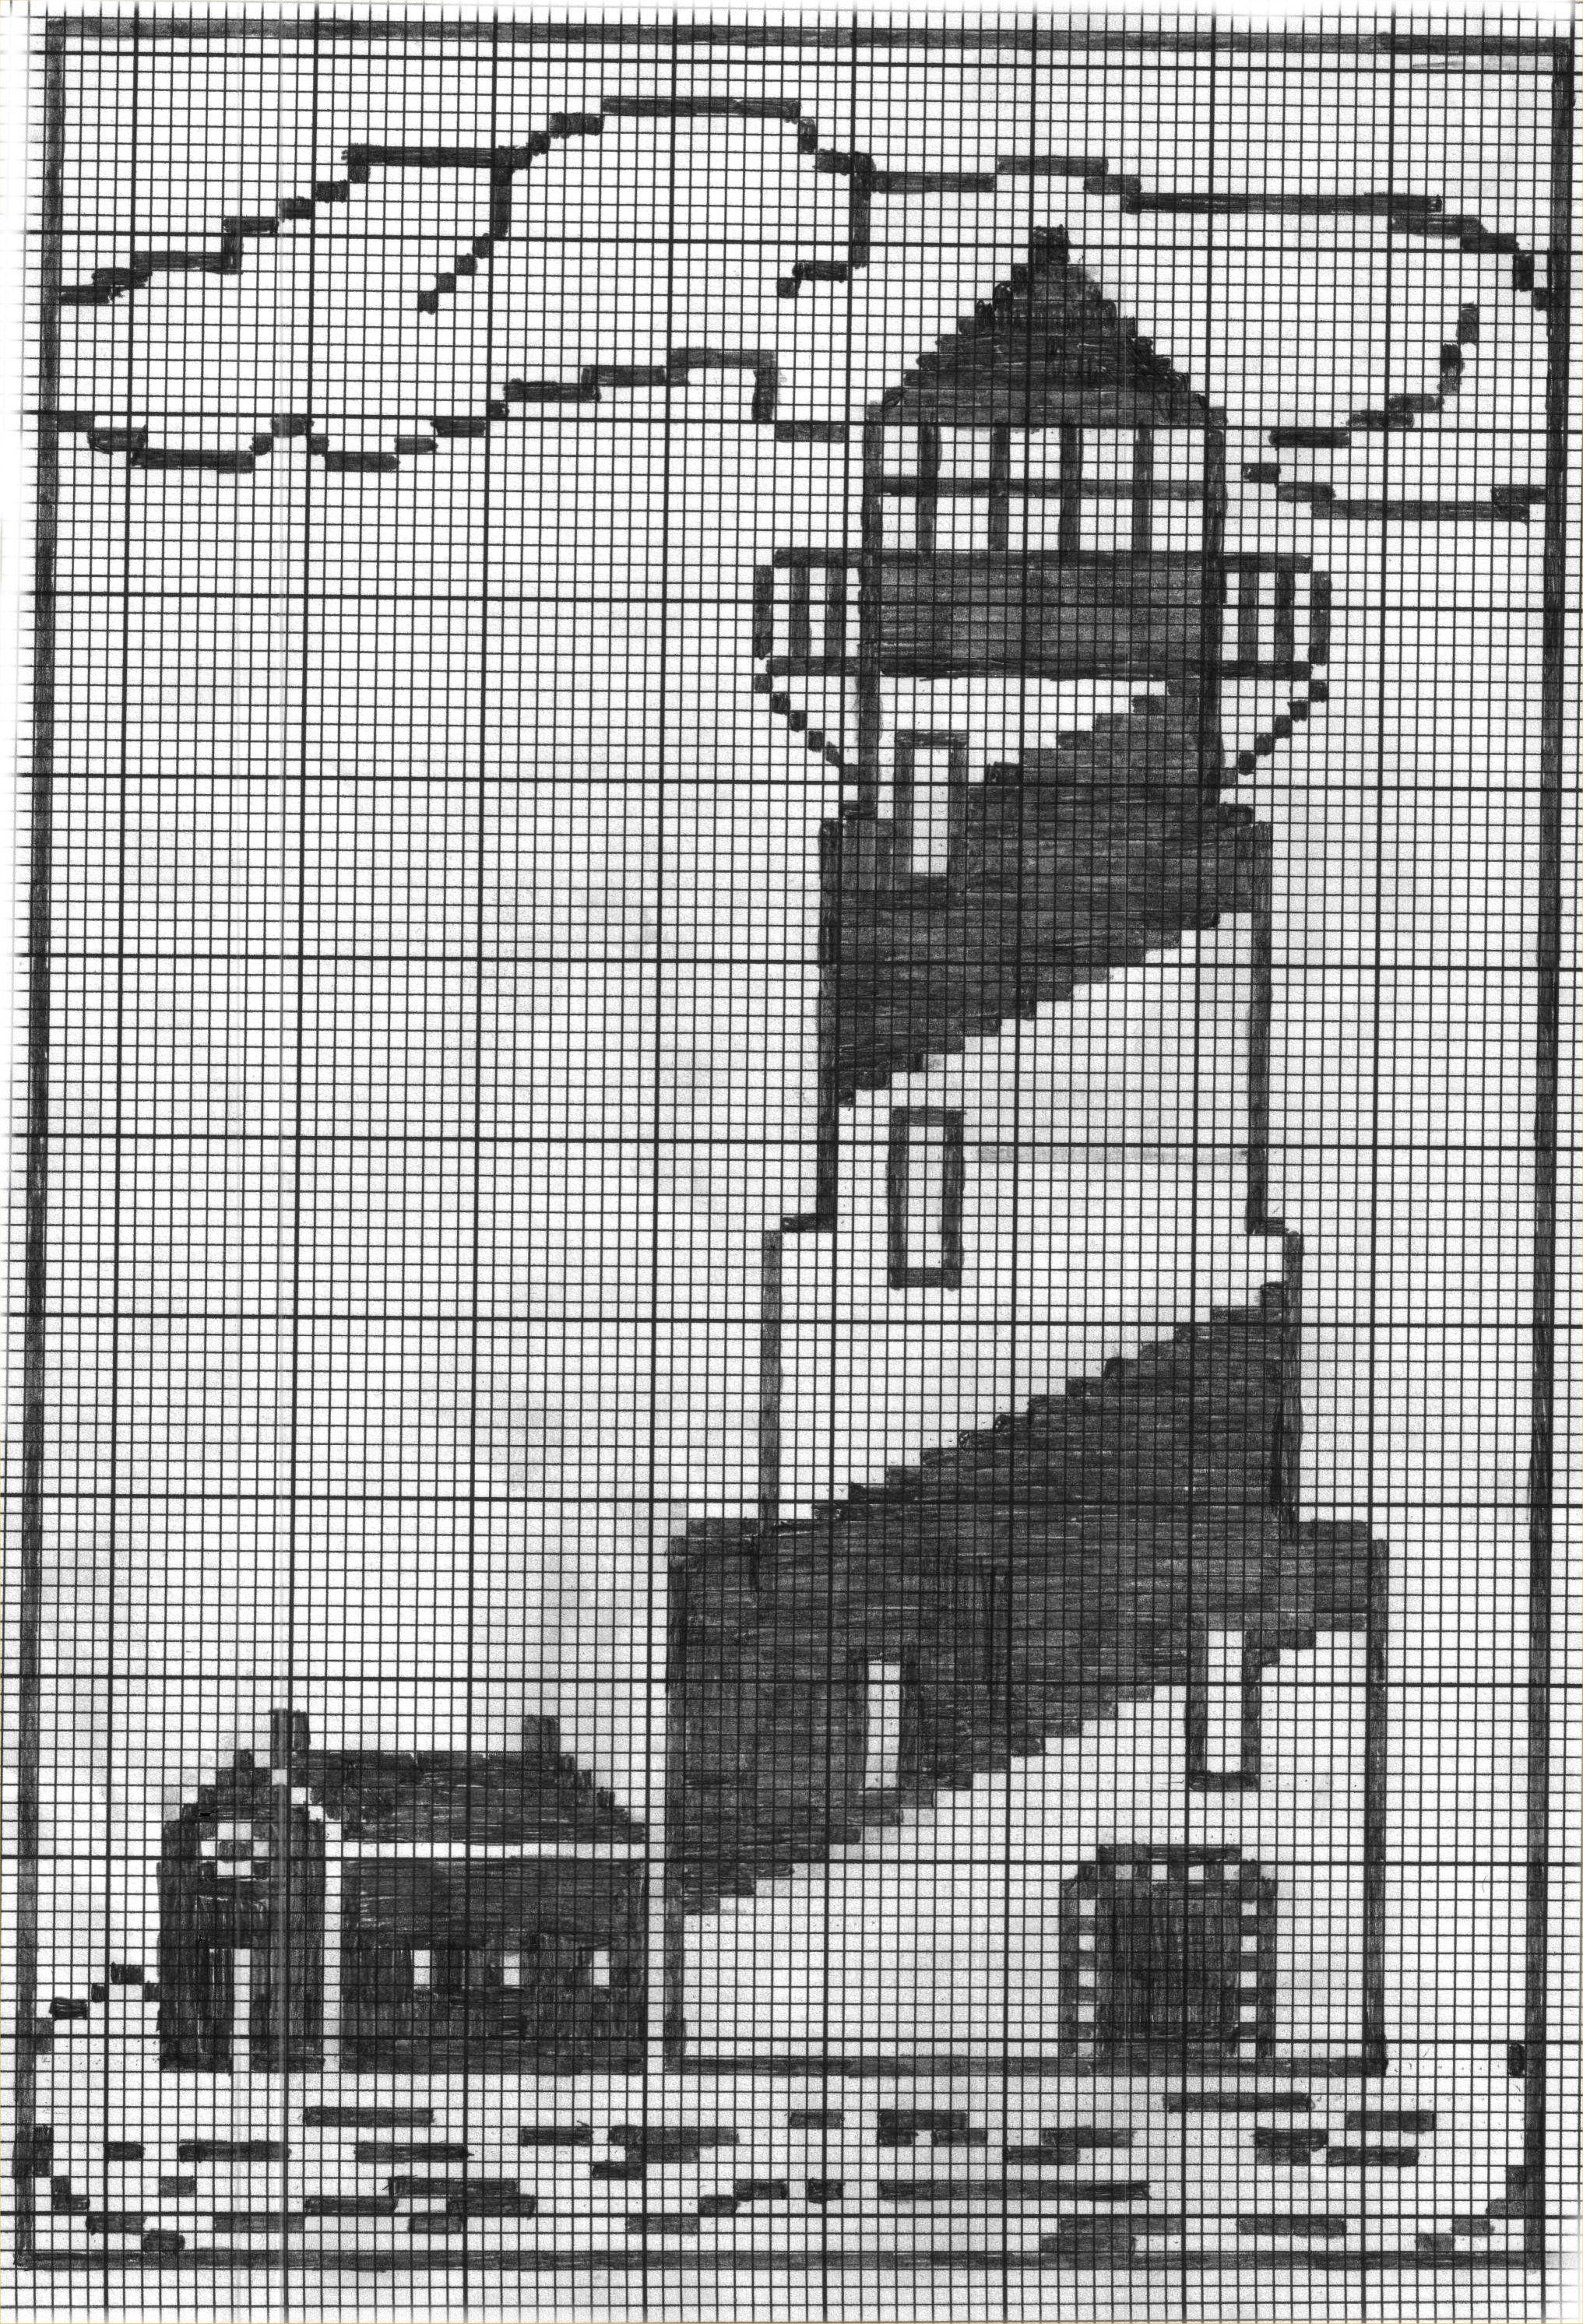 Leuchtturm | Leuchtturm gardine | Pinterest | Faro, Punto de cruz y ...